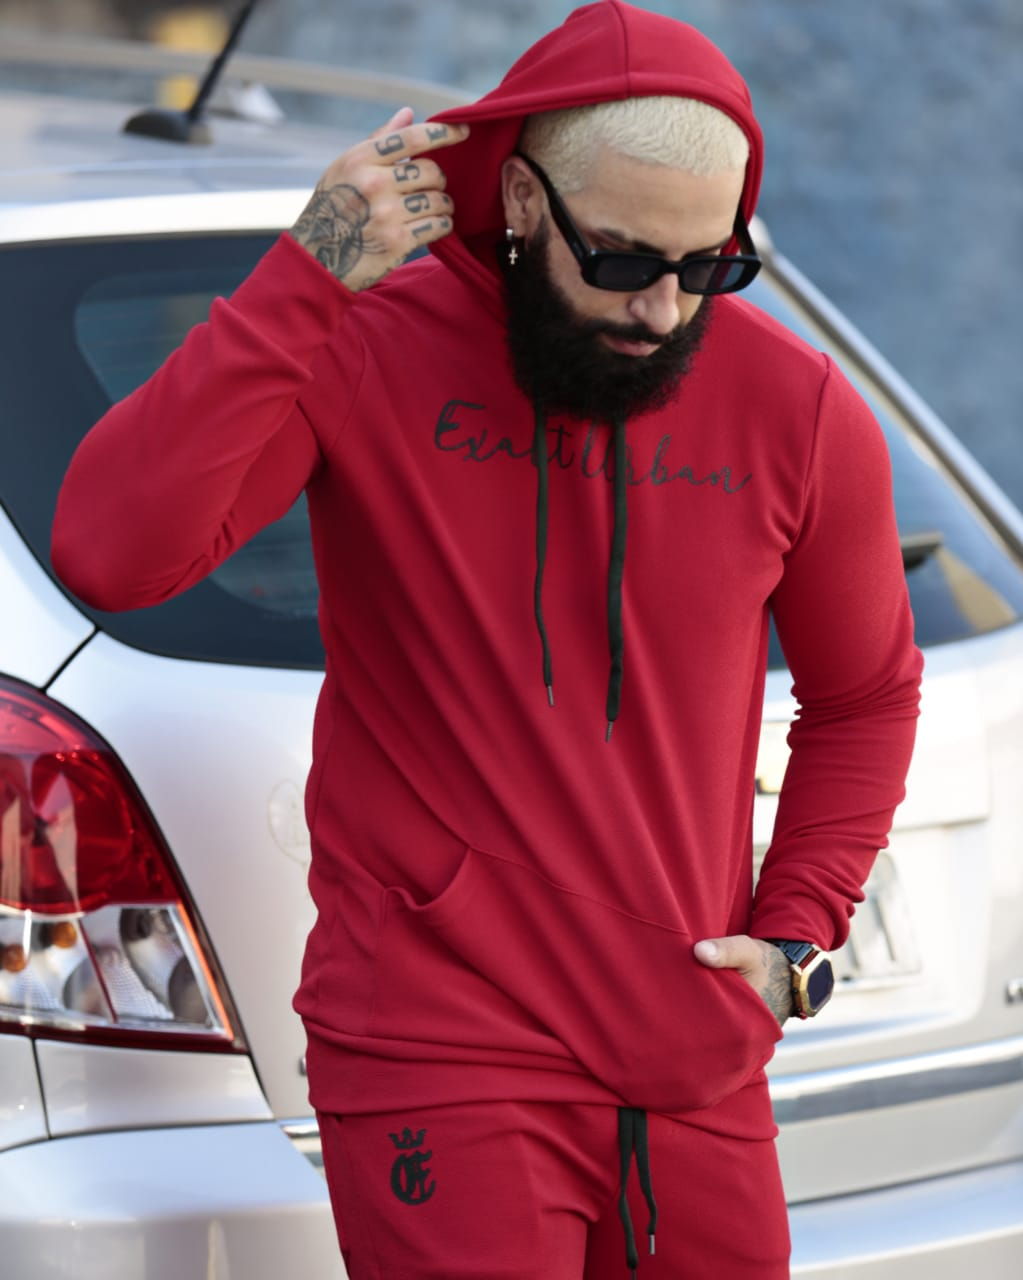 Conjunto Exalt Urban Vermelho Version Deluxe  - Harpia Moda - Moda Masculina & Acessórios